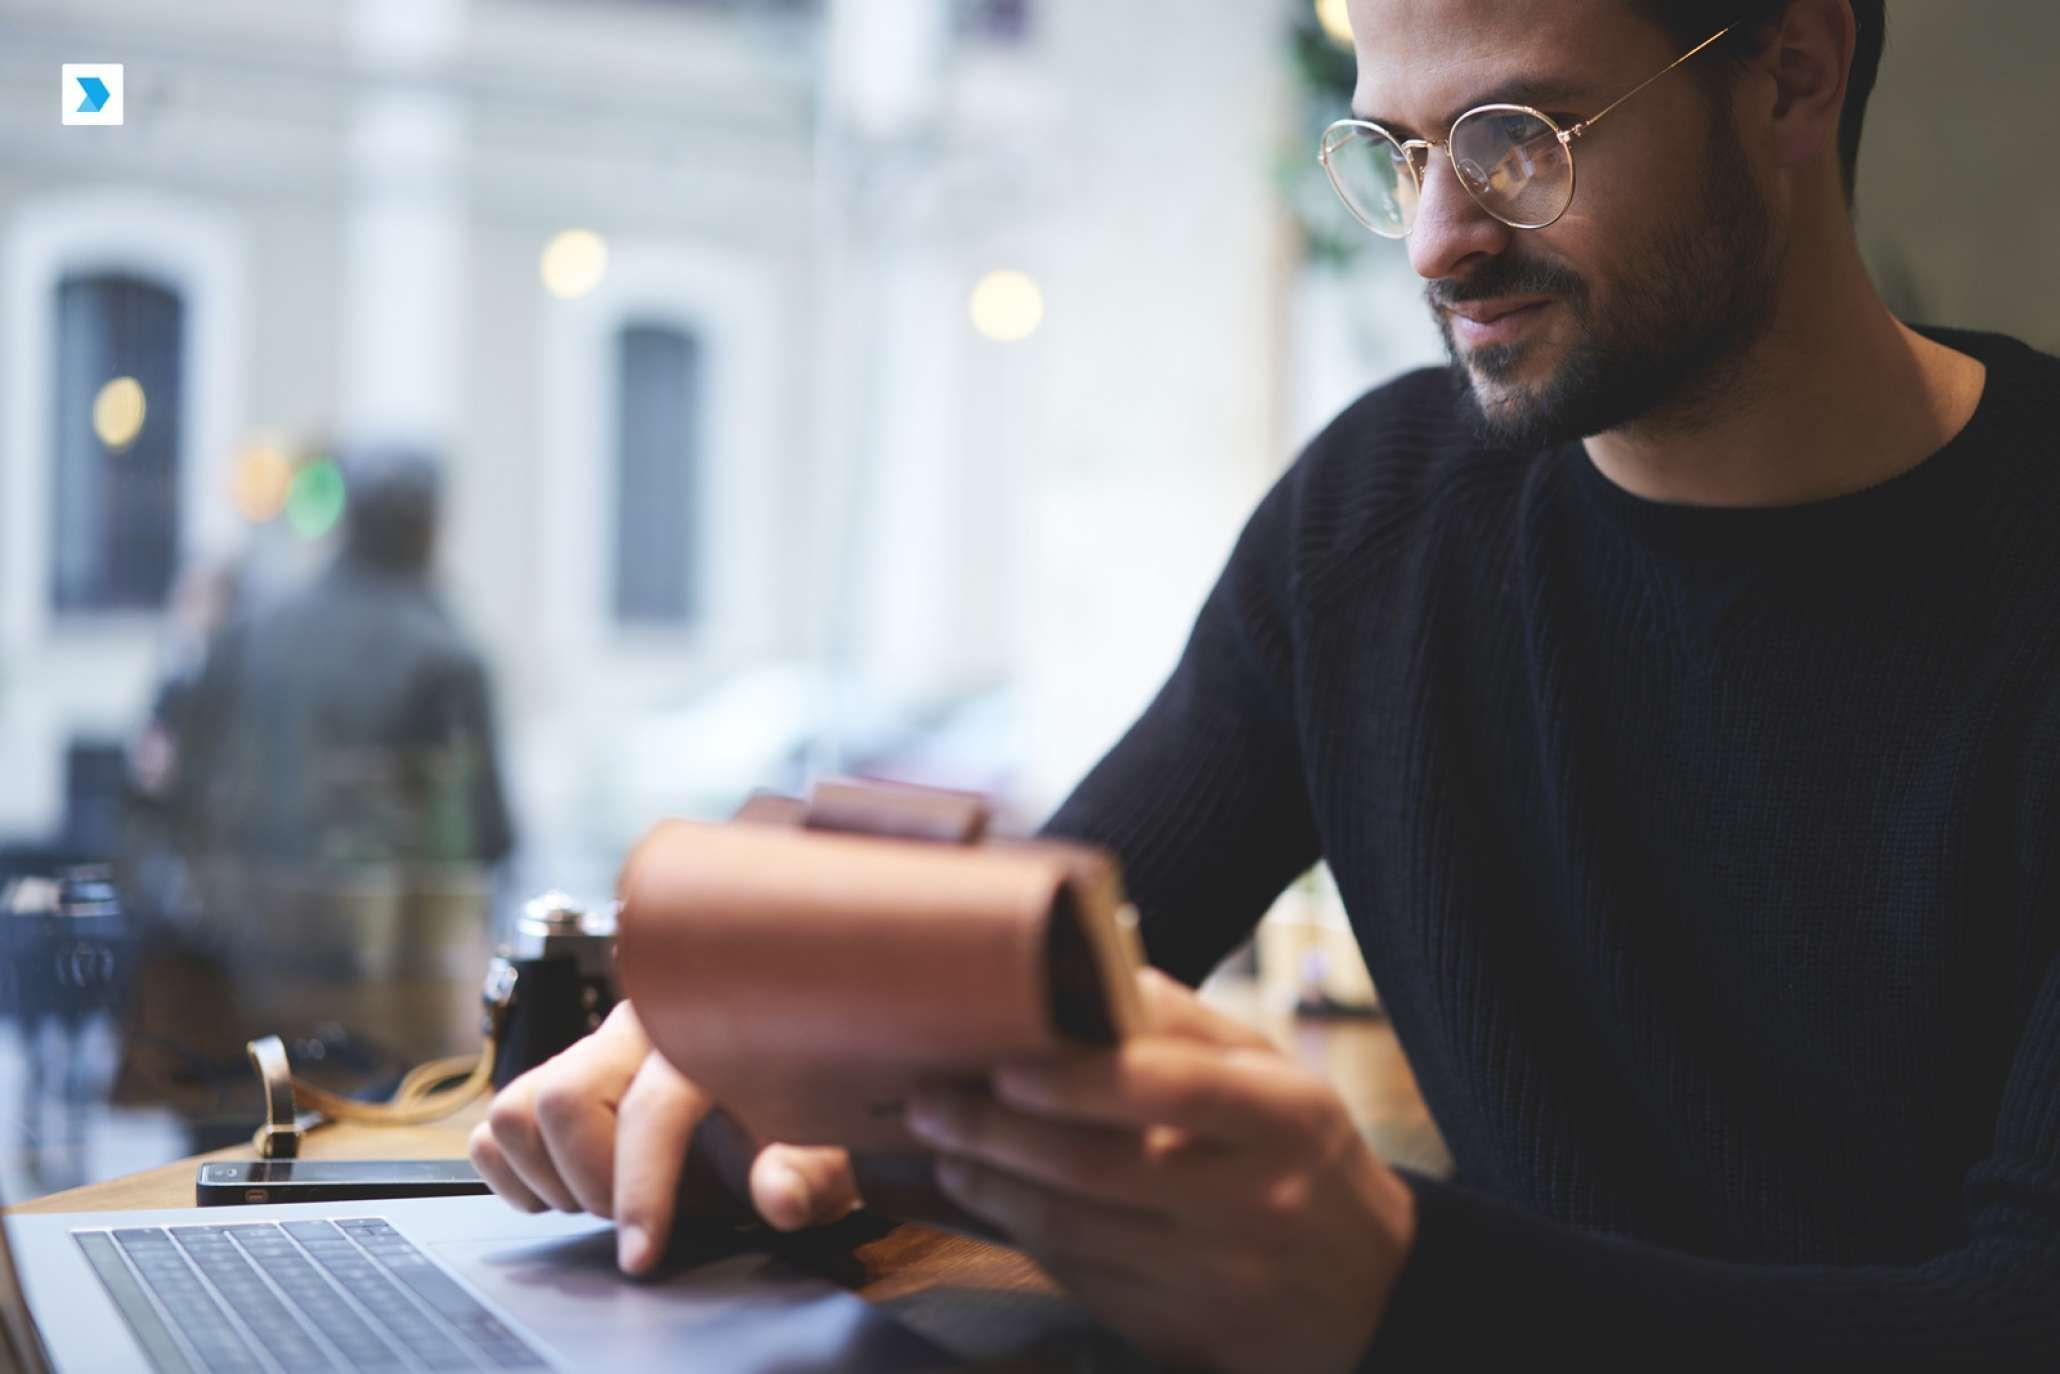 7 simple ways to improve your digital marketing resume